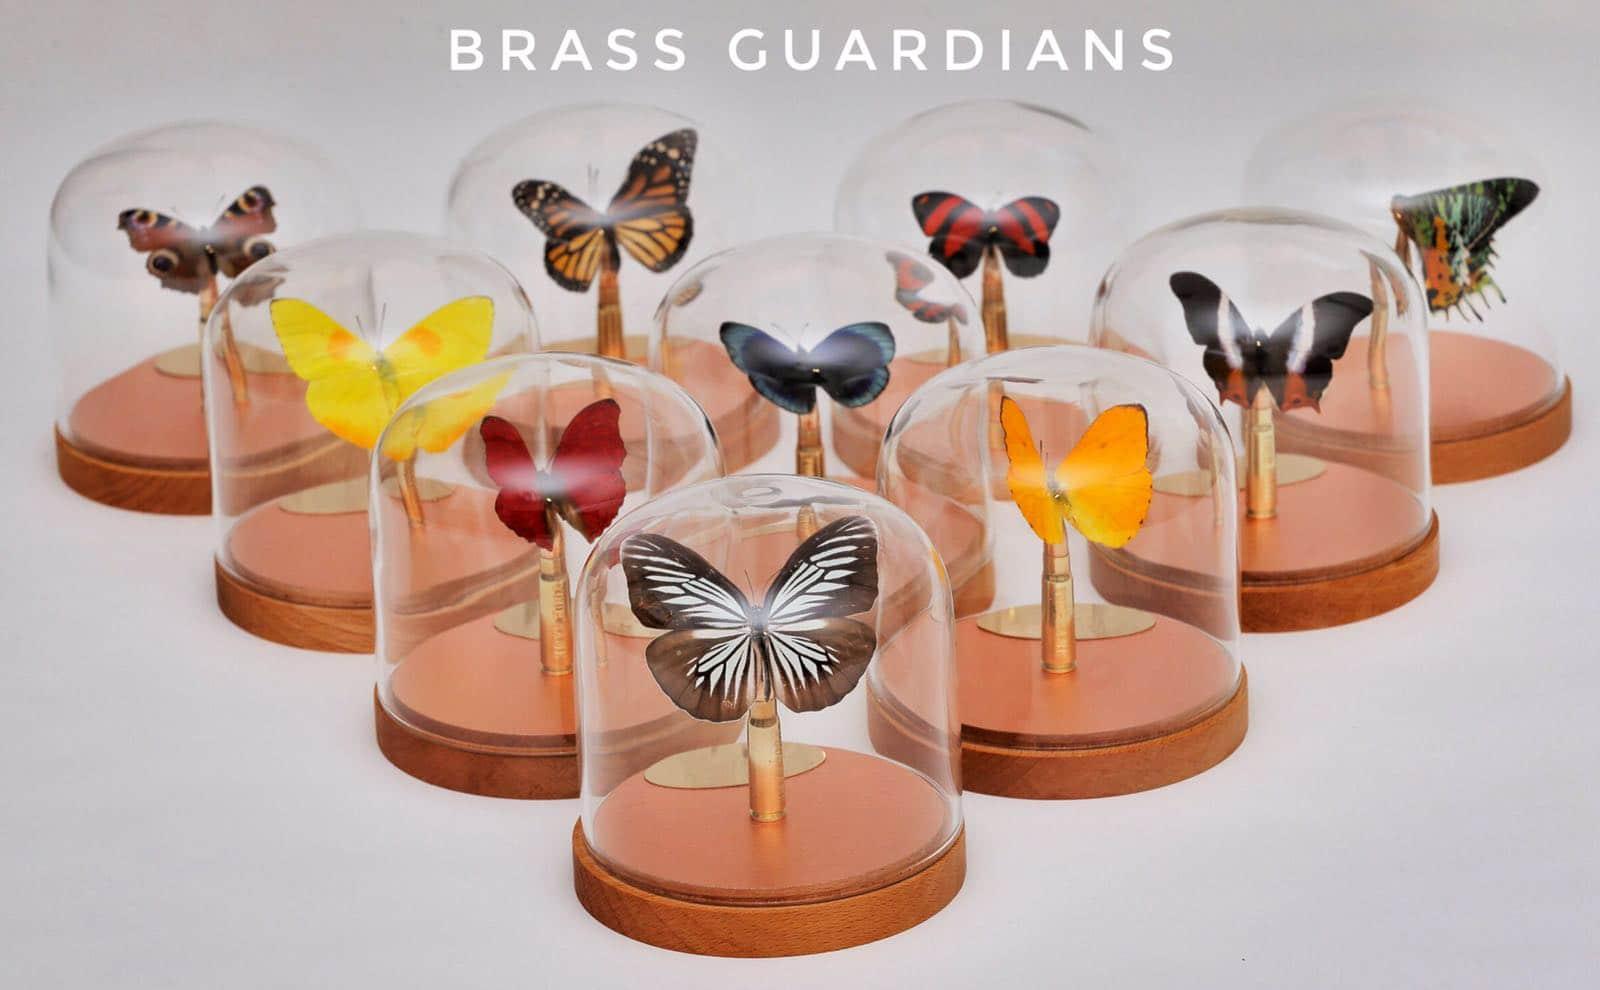 Bran Symondson, Brass Guardians, 2017